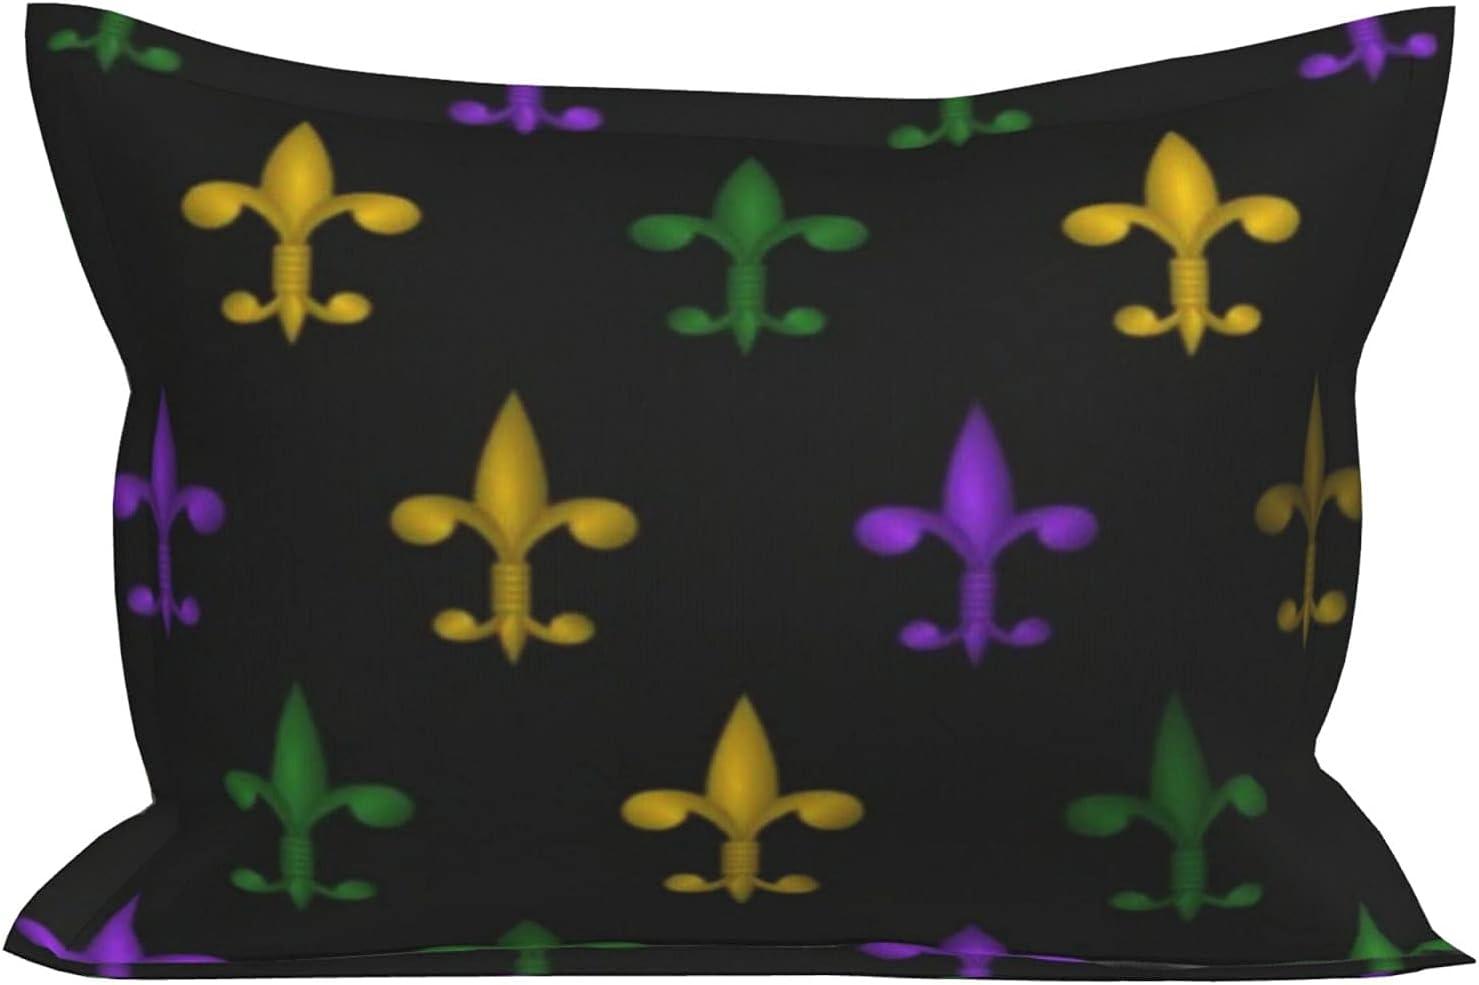 huaxian Fleur De Lis Mardi Gras Max 62% OFF Green - Sale Purple Pillowcase Gold